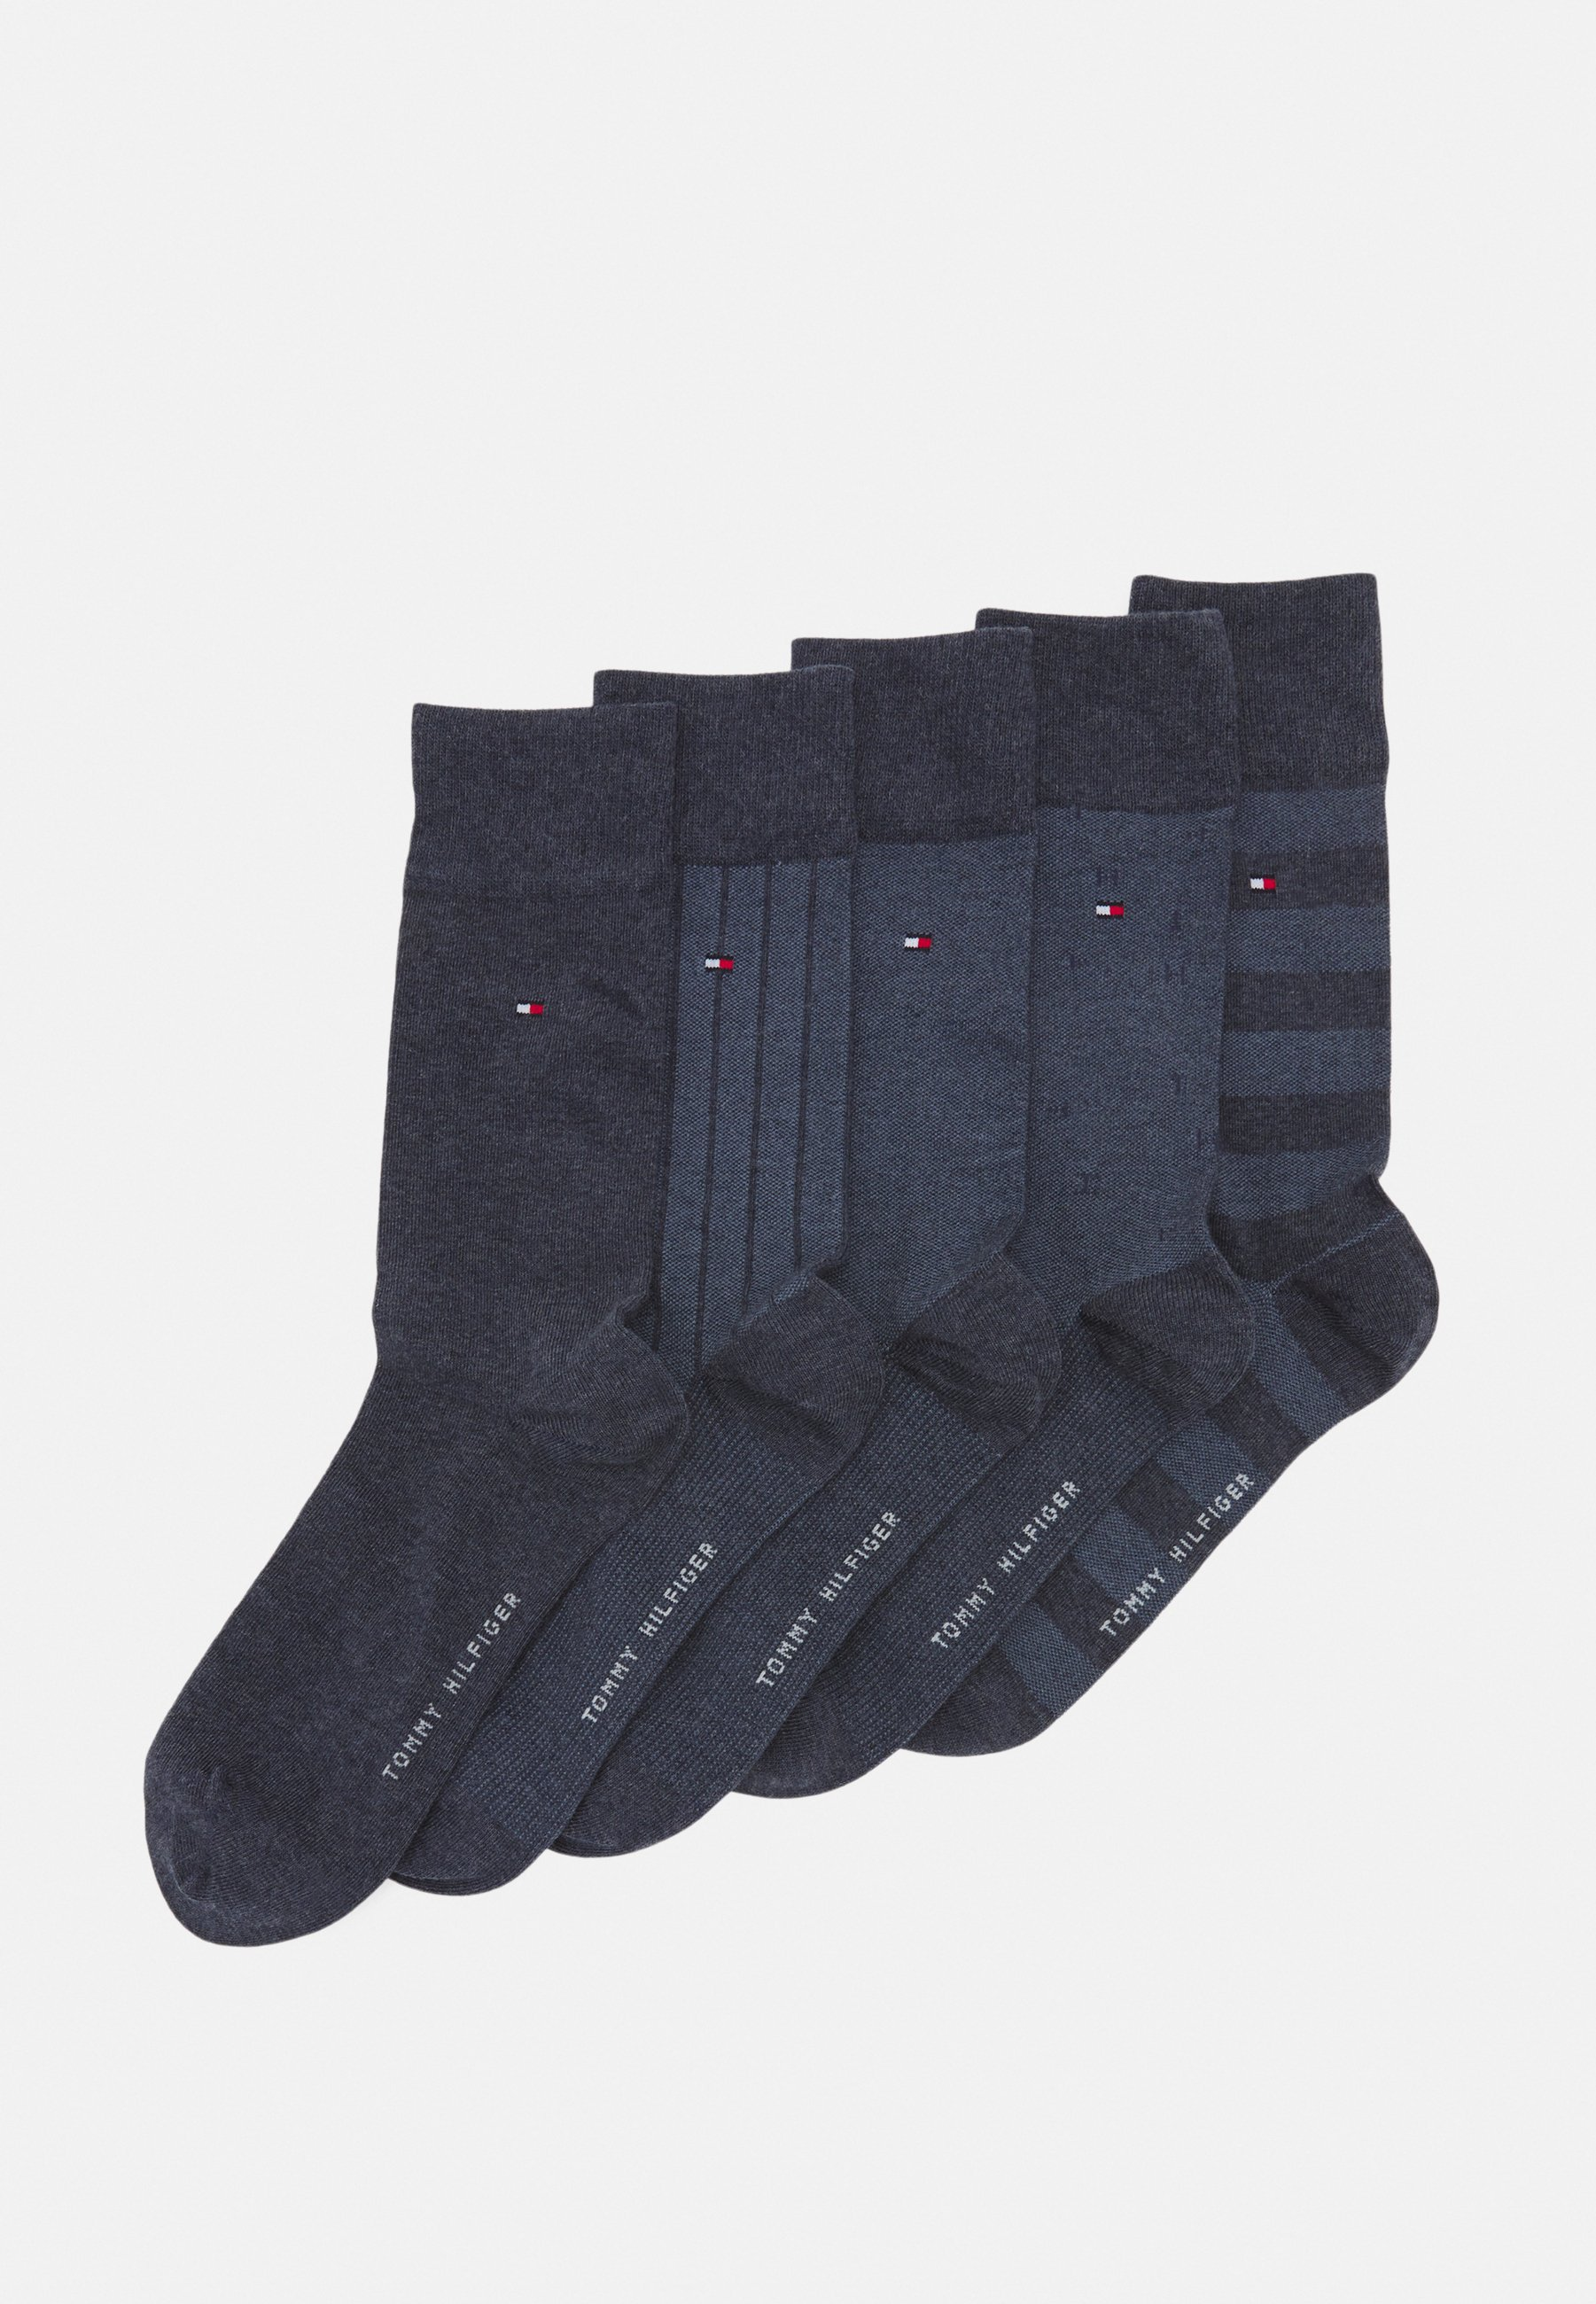 Homme MEN SOCK GIFTBOX BIRDEYE 5 PACK - Chaussettes